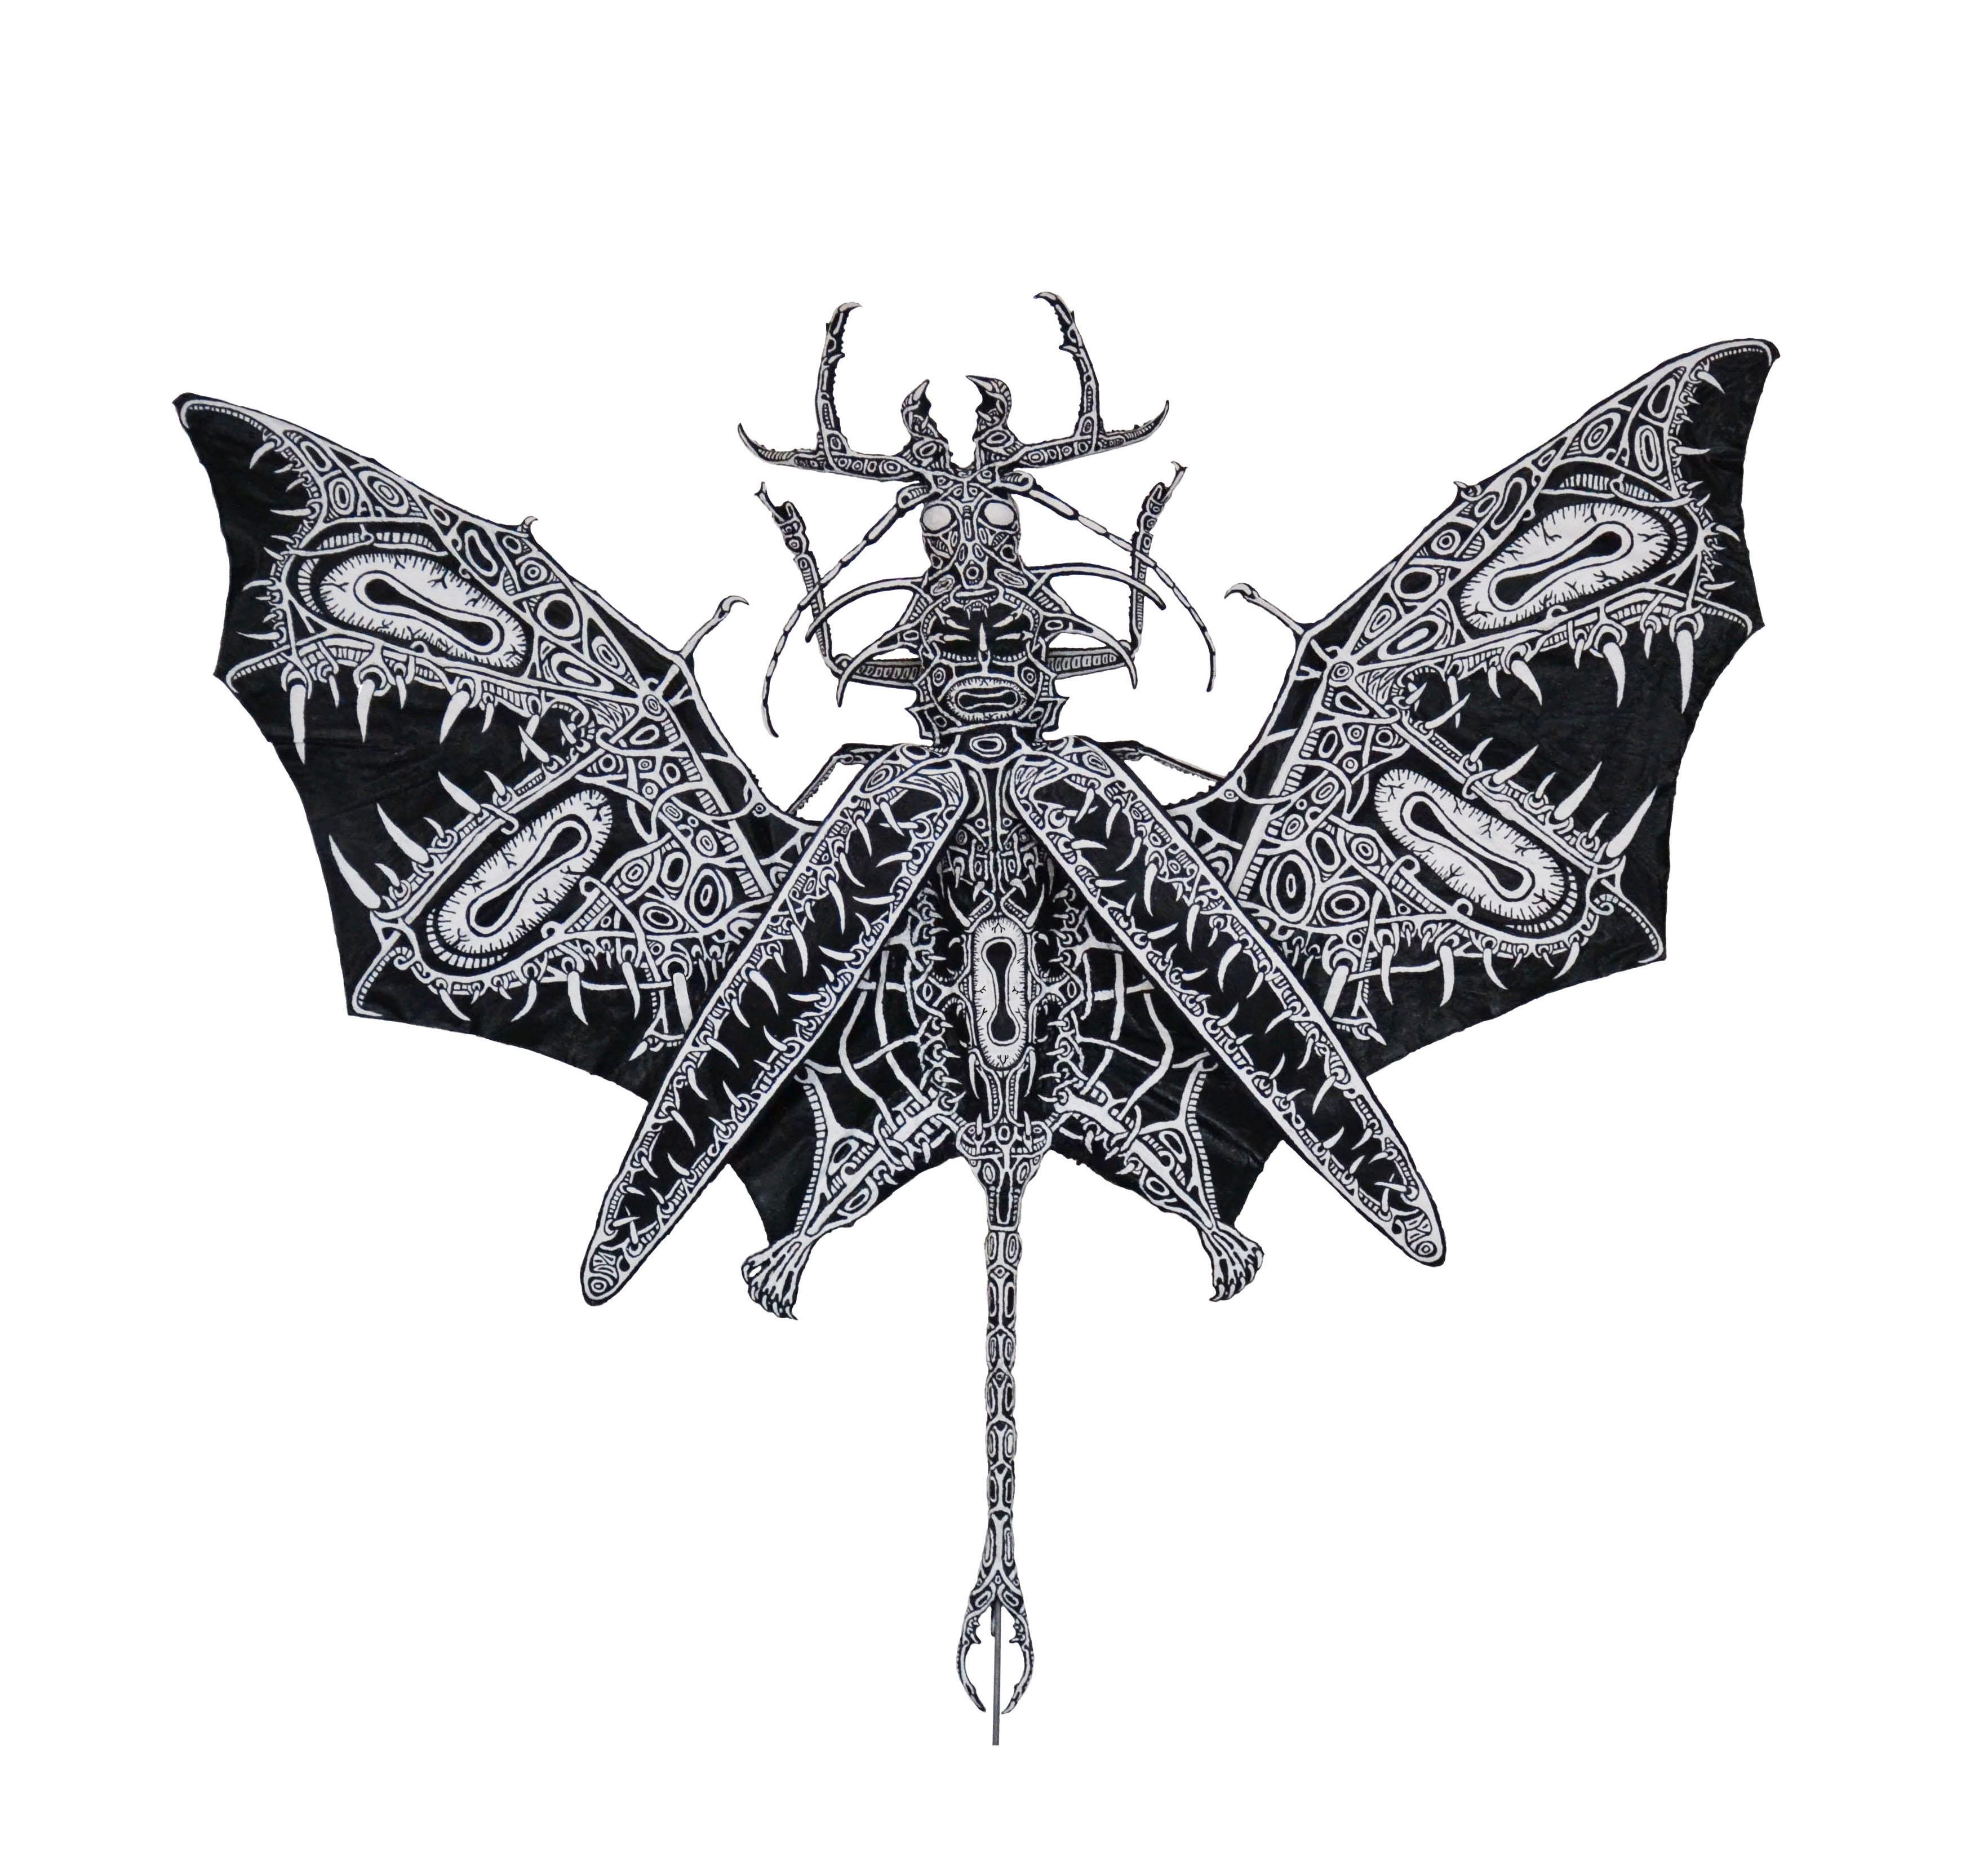 Titanopteryx Dantei